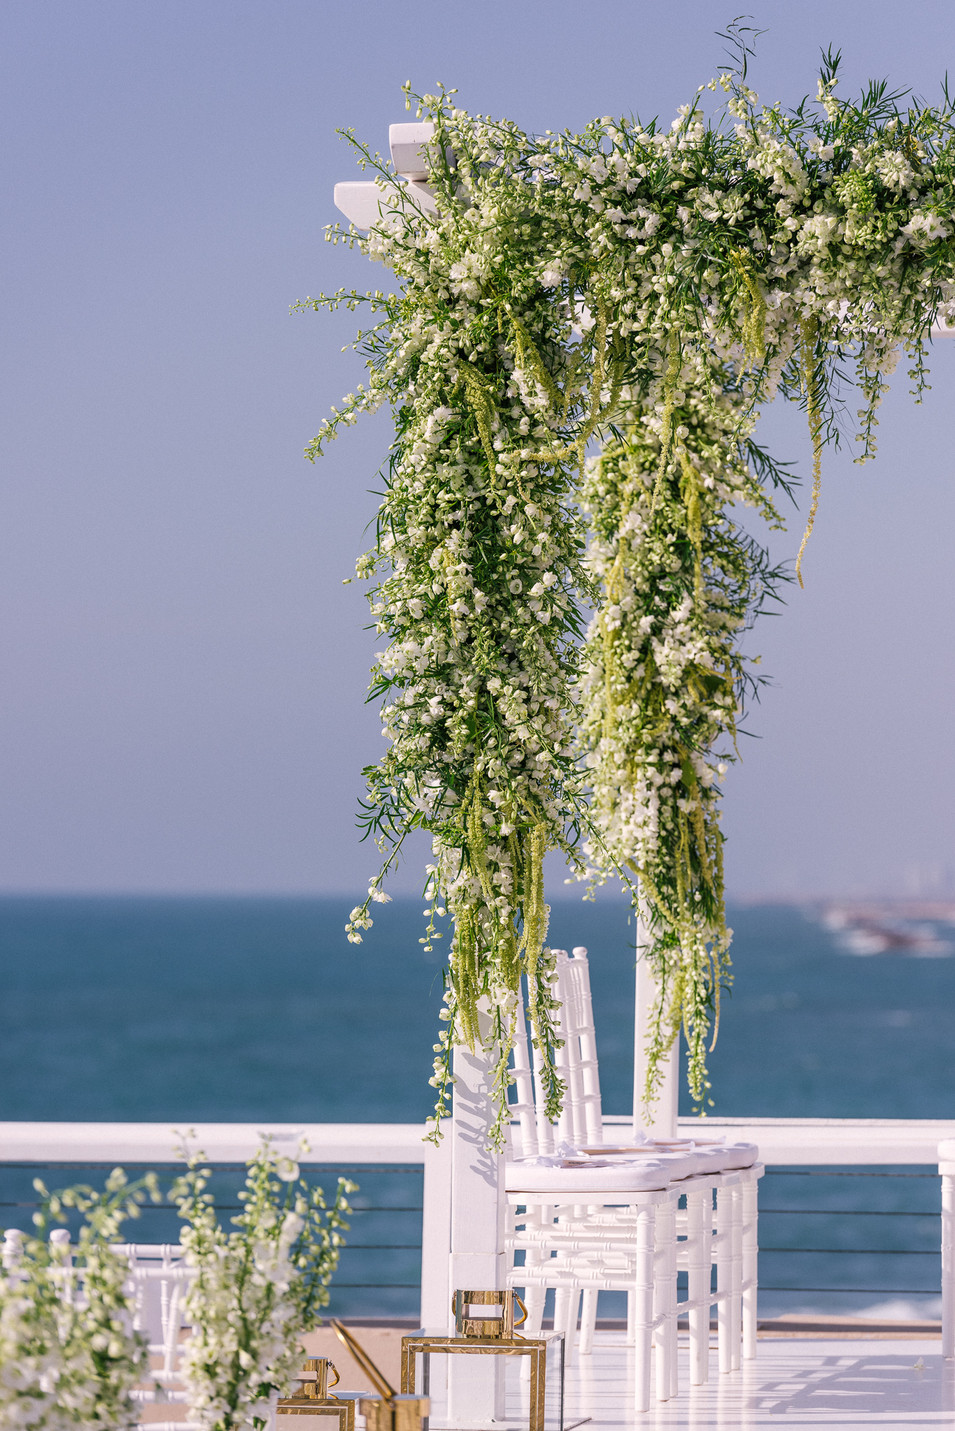 House of Green | Yahav Green | Yulia Tokarev